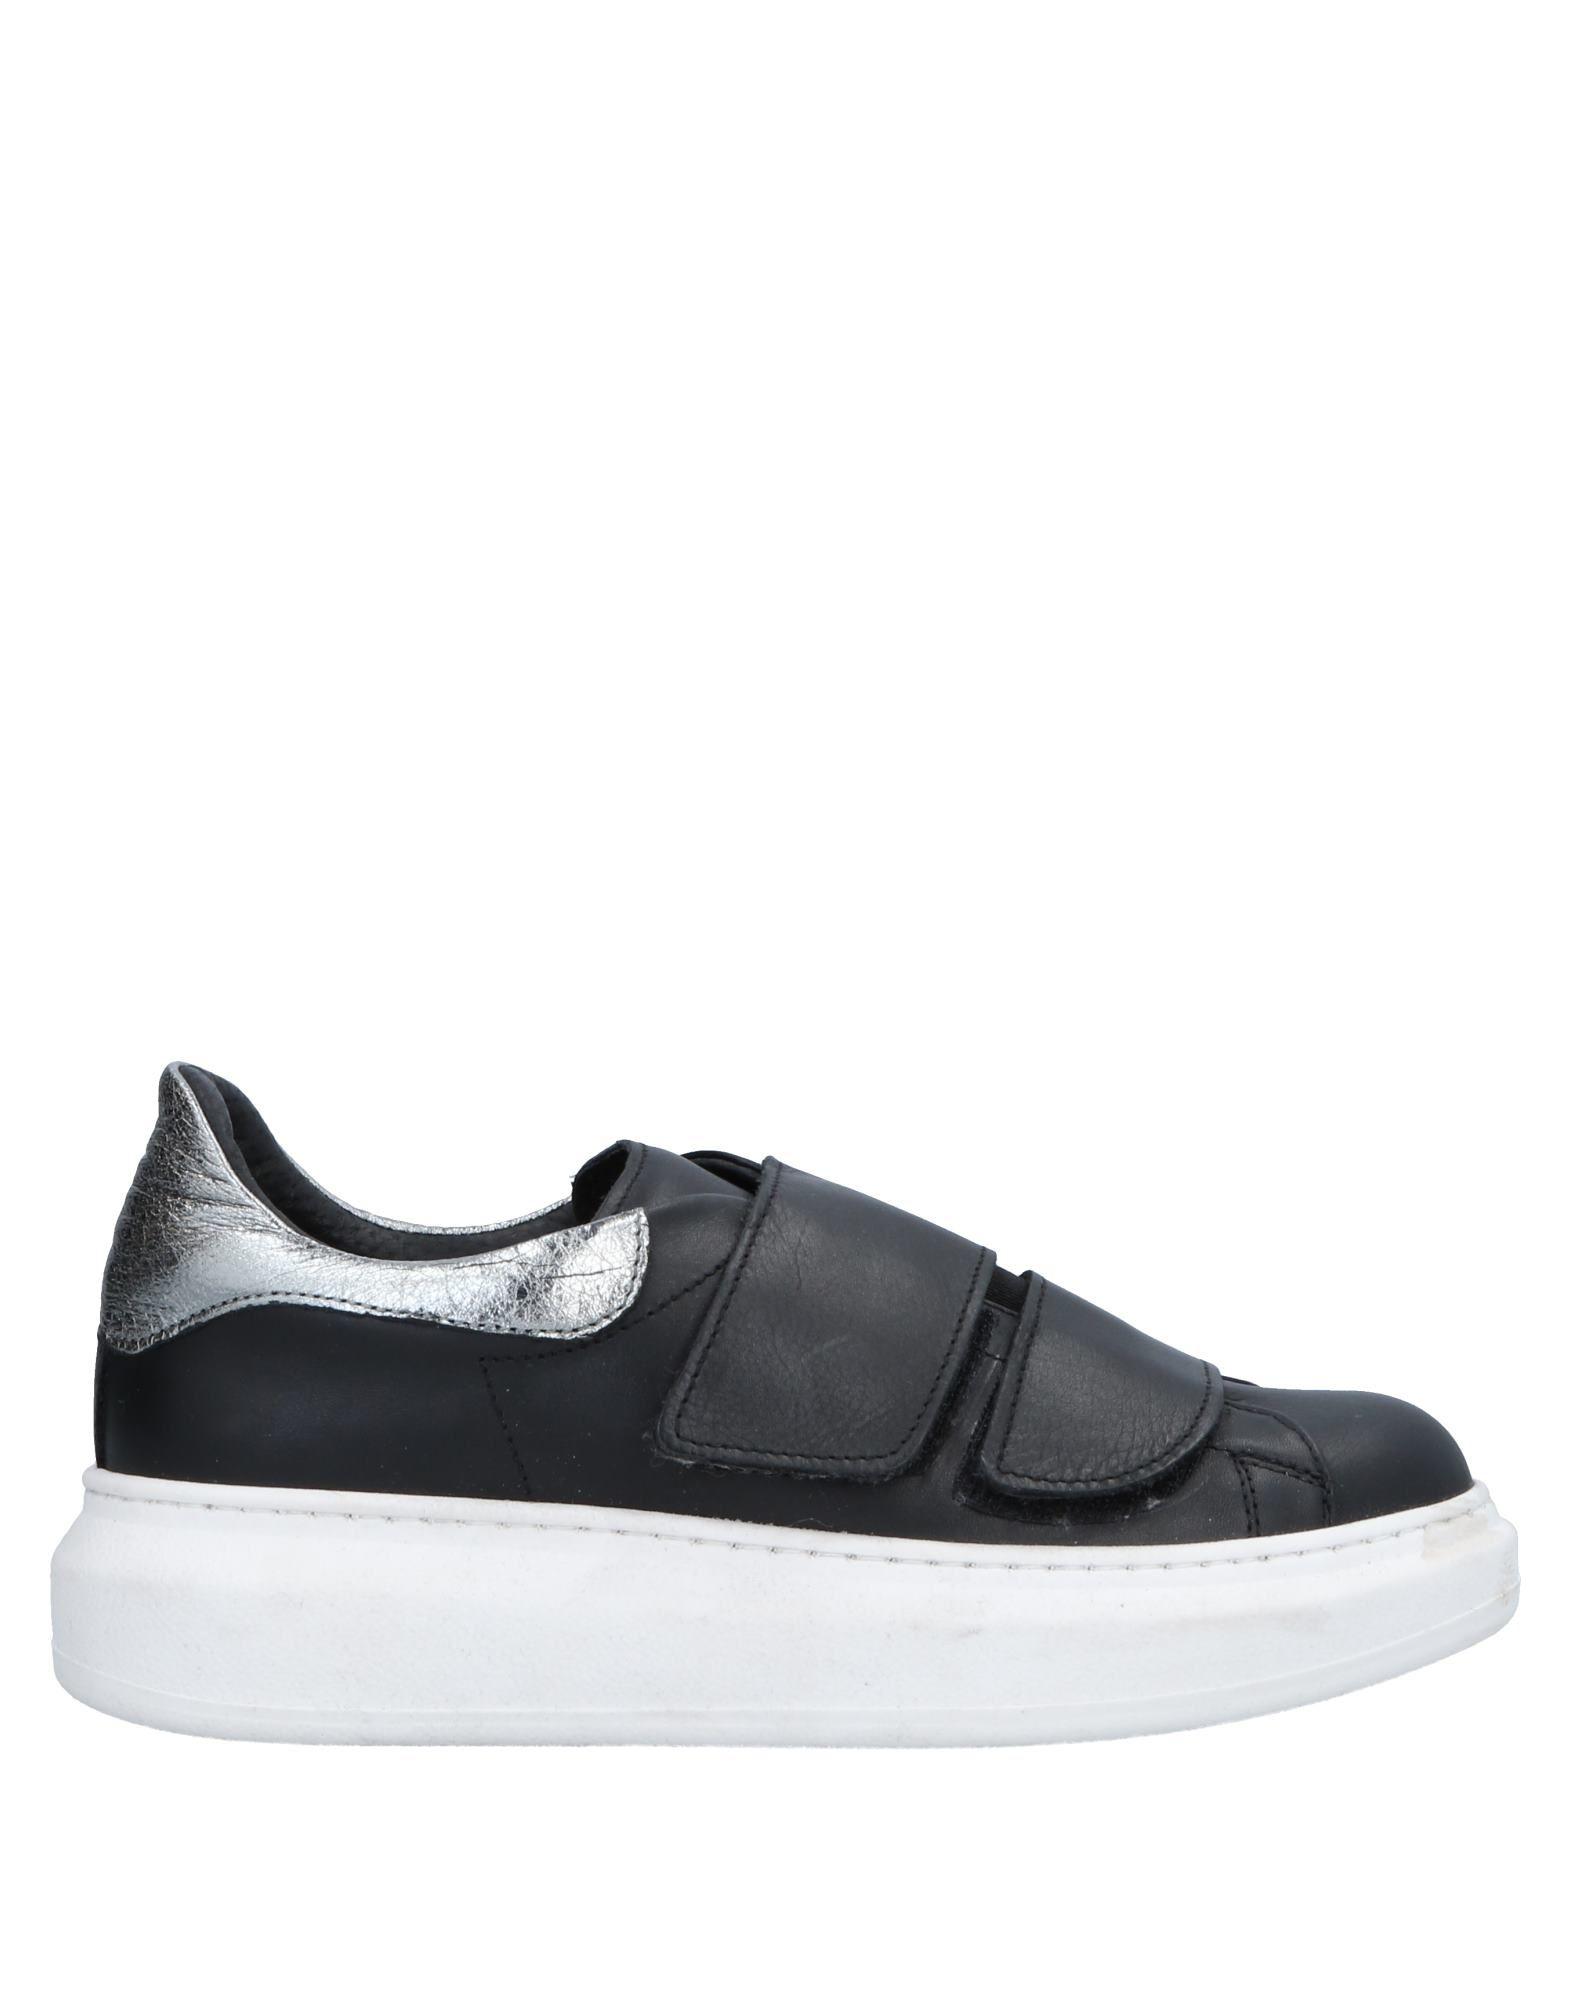 Lea 11543378LX Gute Qualität beliebte Schuhe